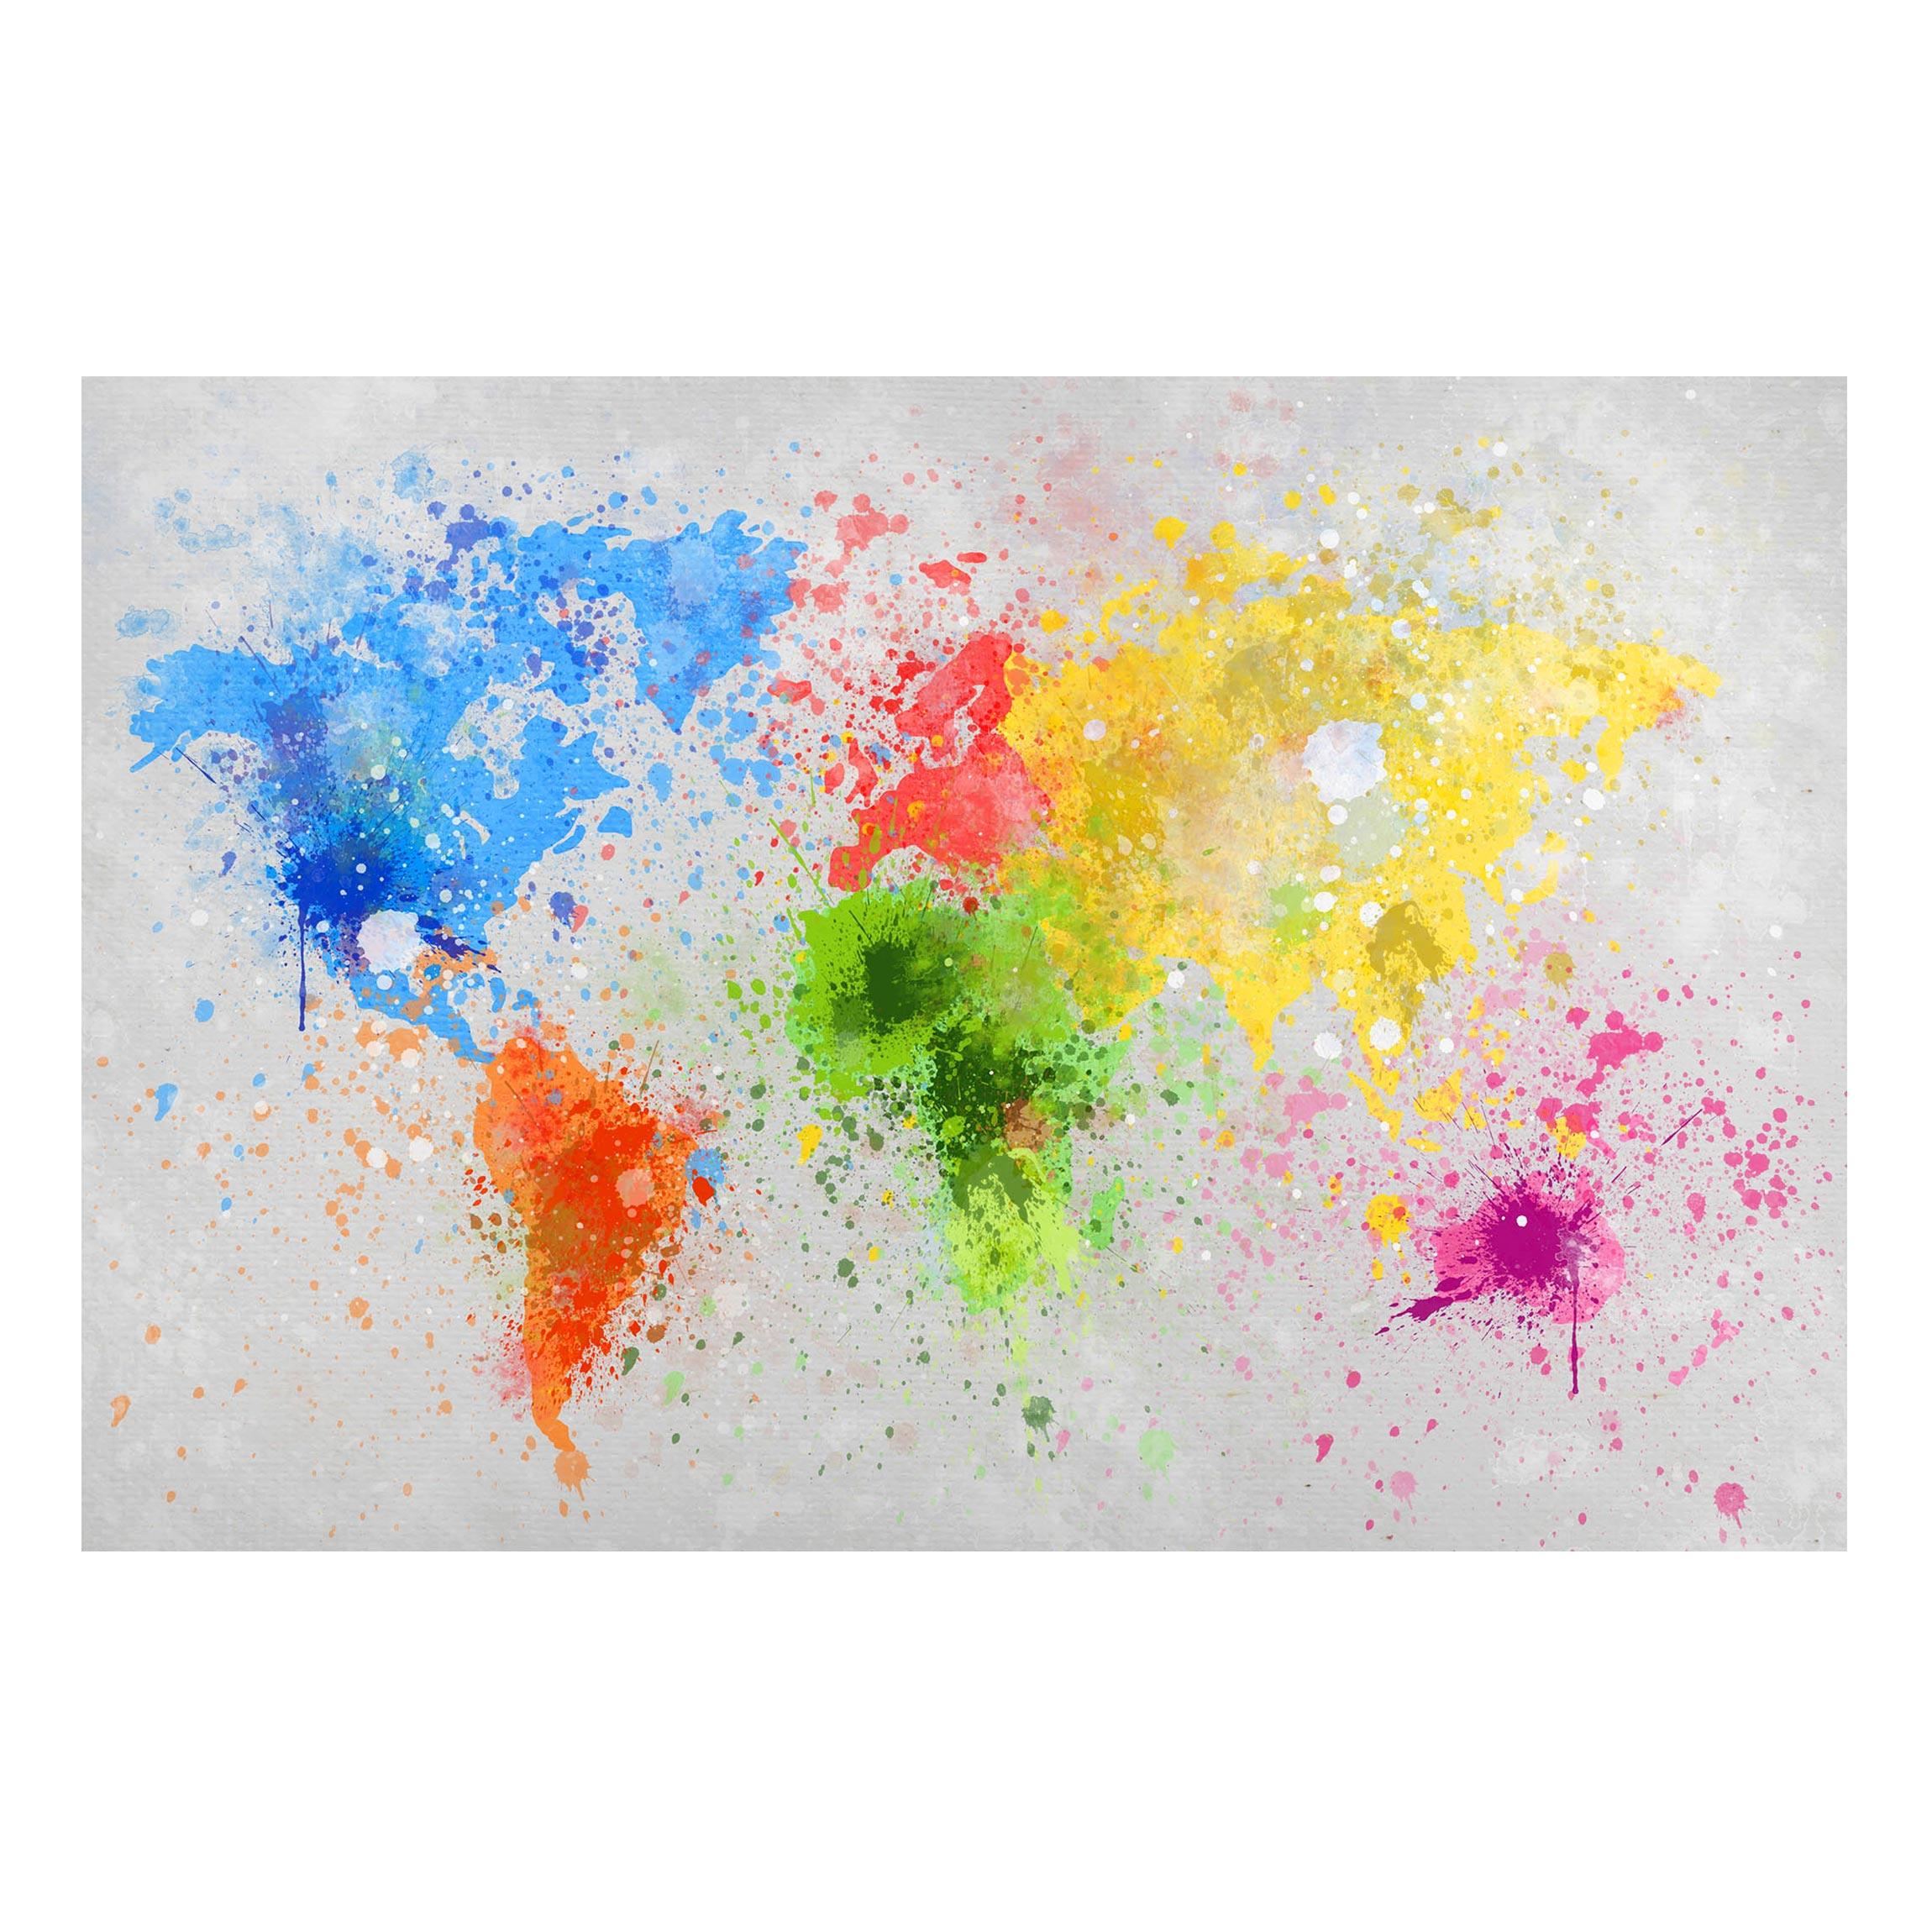 Magnetic Board - Colorful paint splatter world map - Landscape Format 2:3